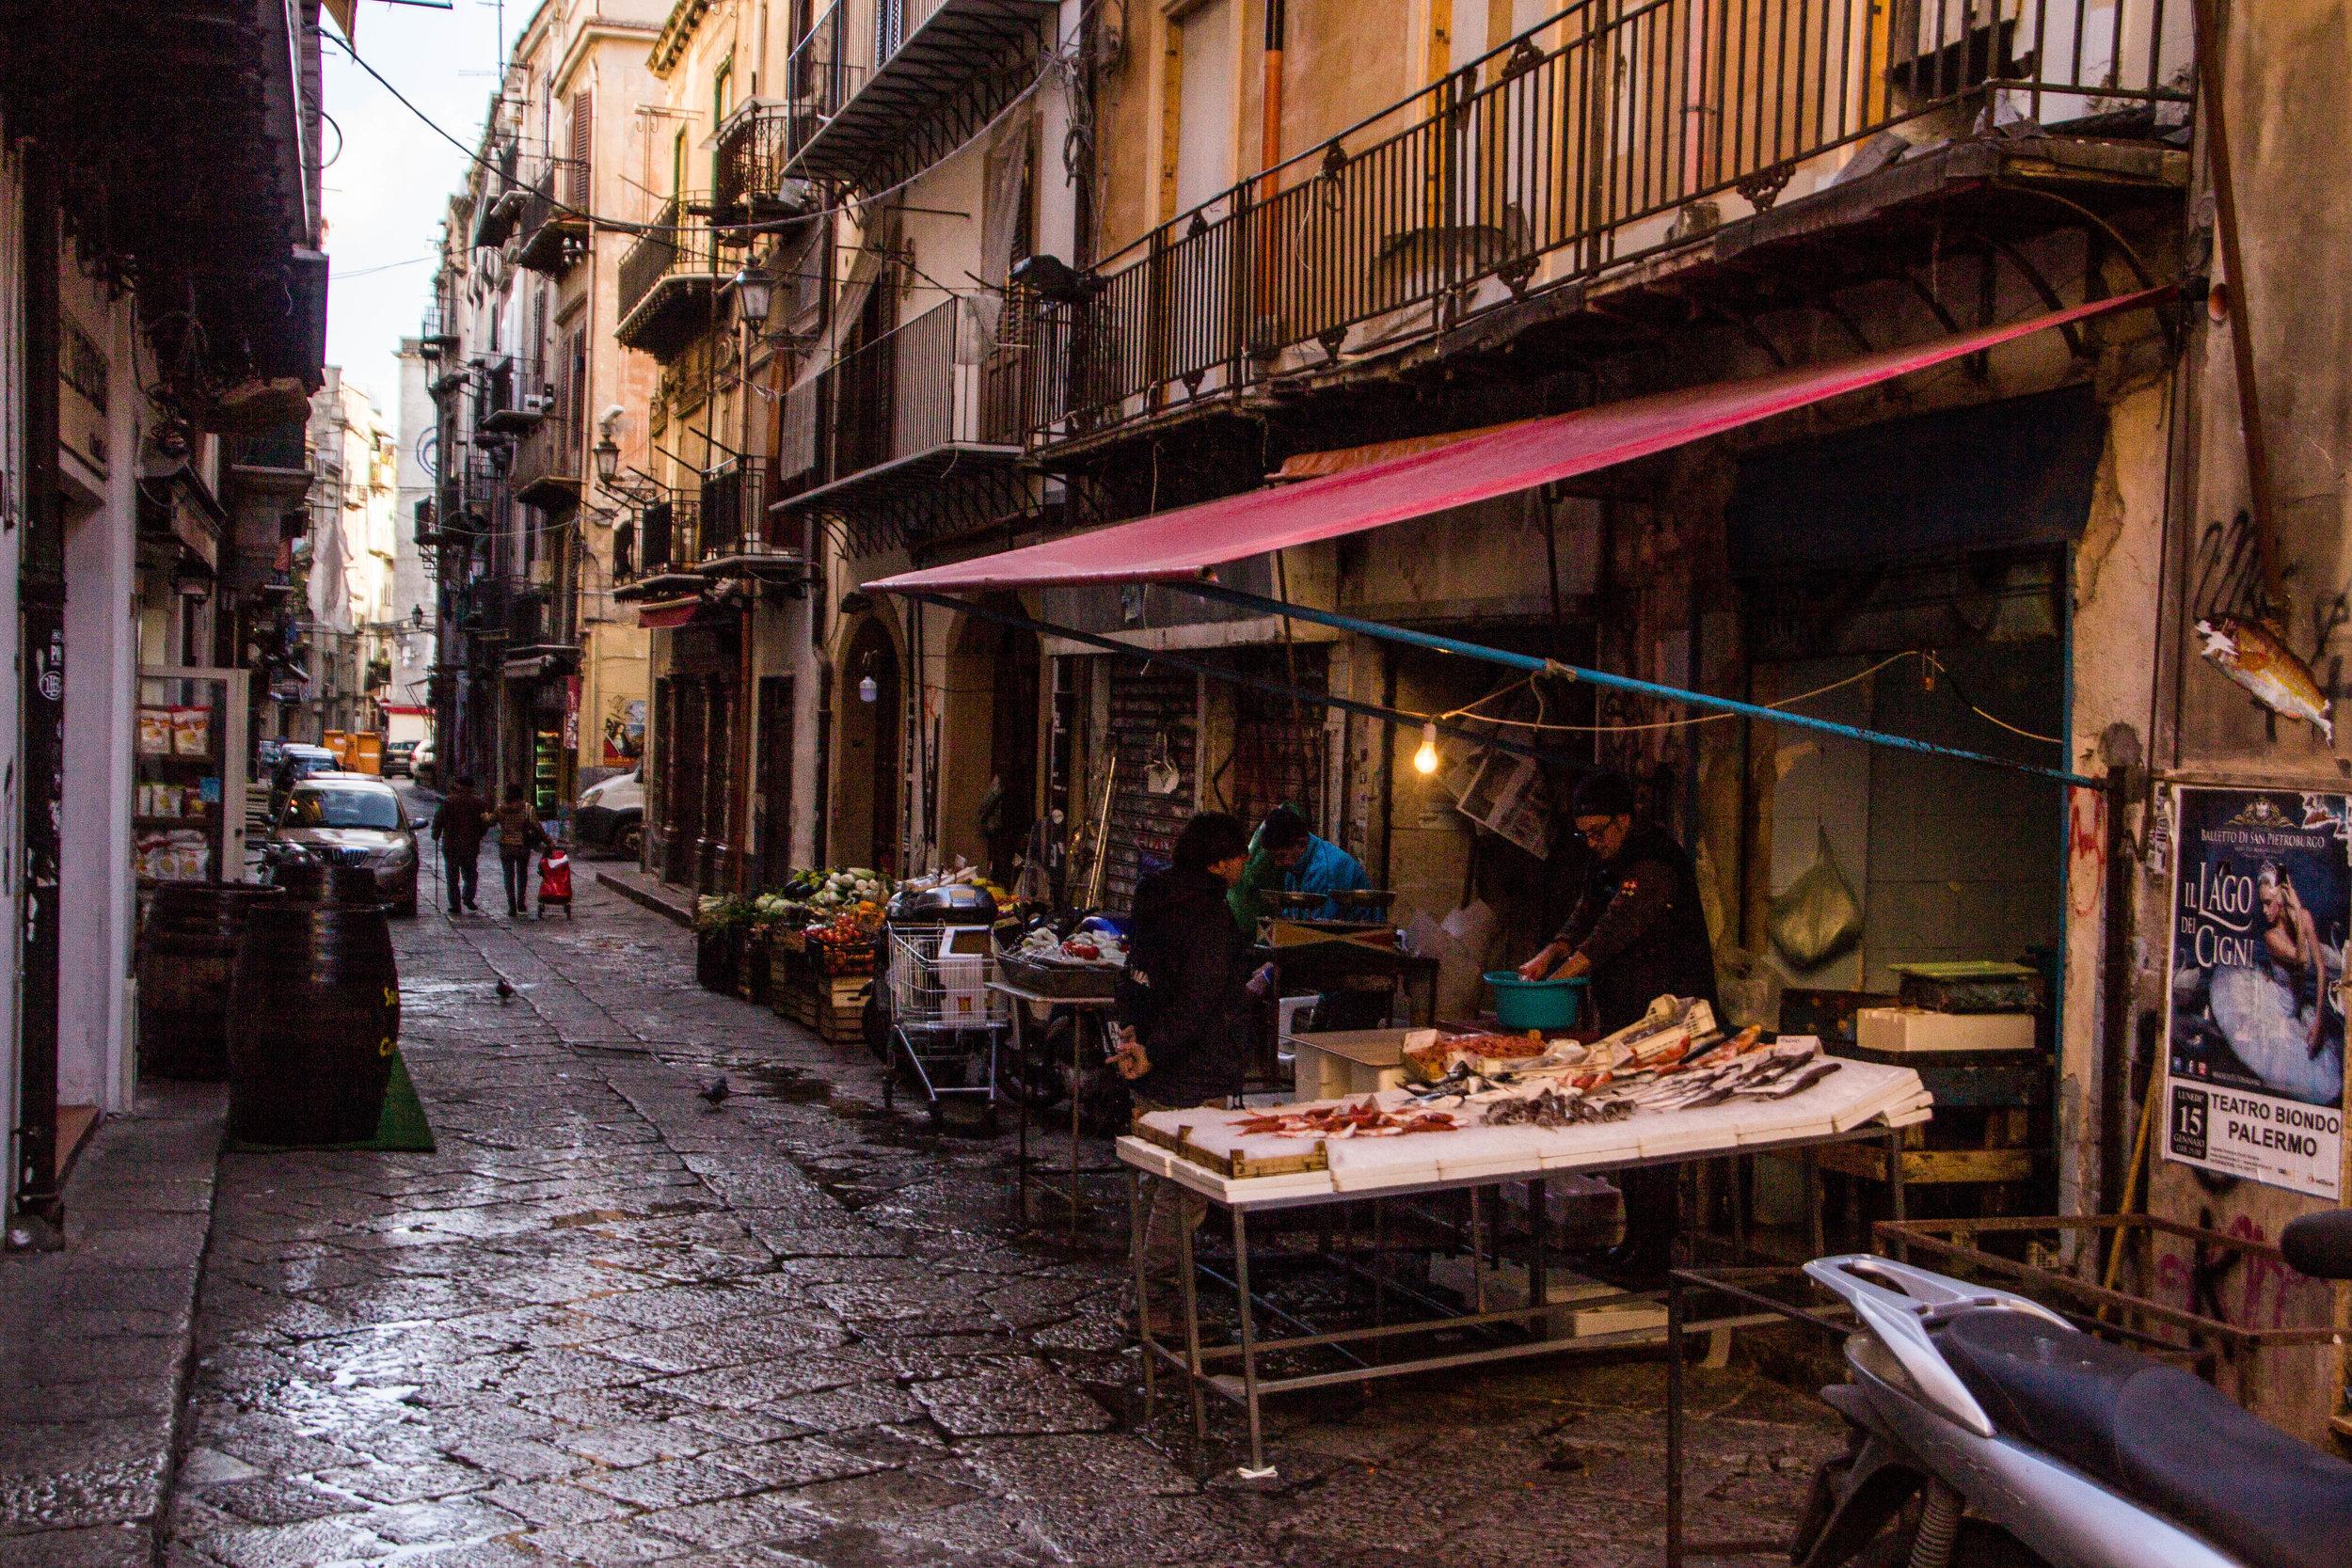 street-photography-palermo-sicily-25.jpg